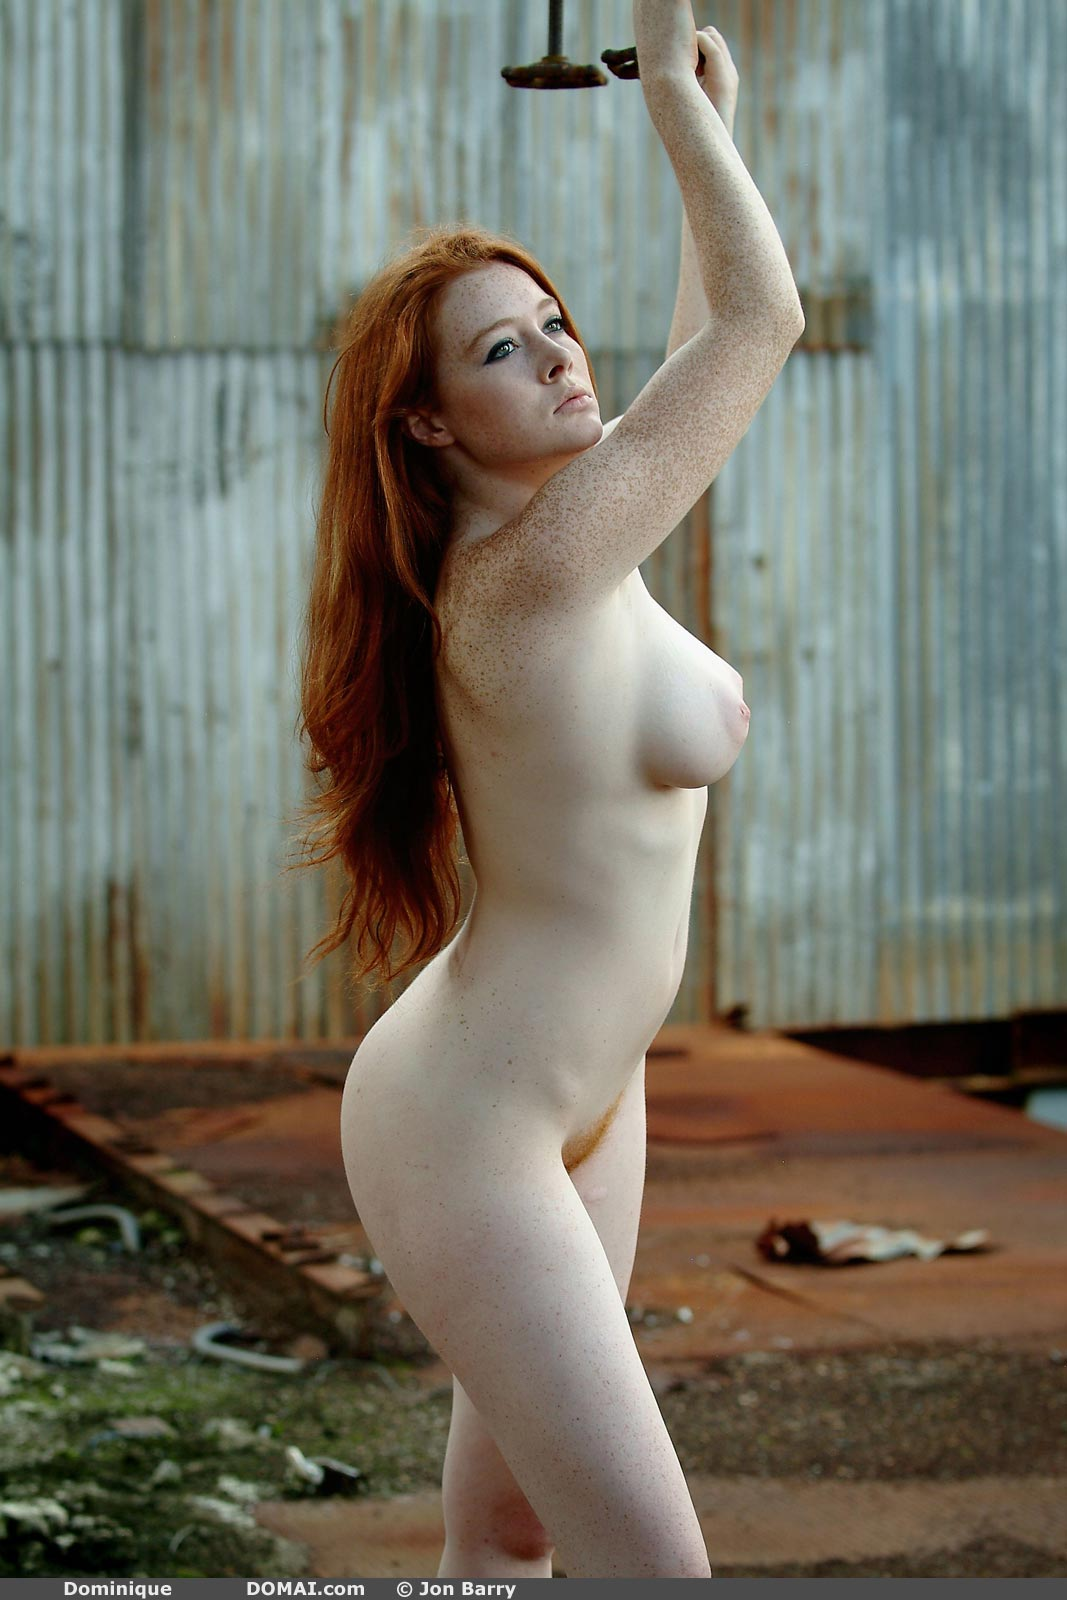 Dominique Beautiful Redhead - NudesPuri.com